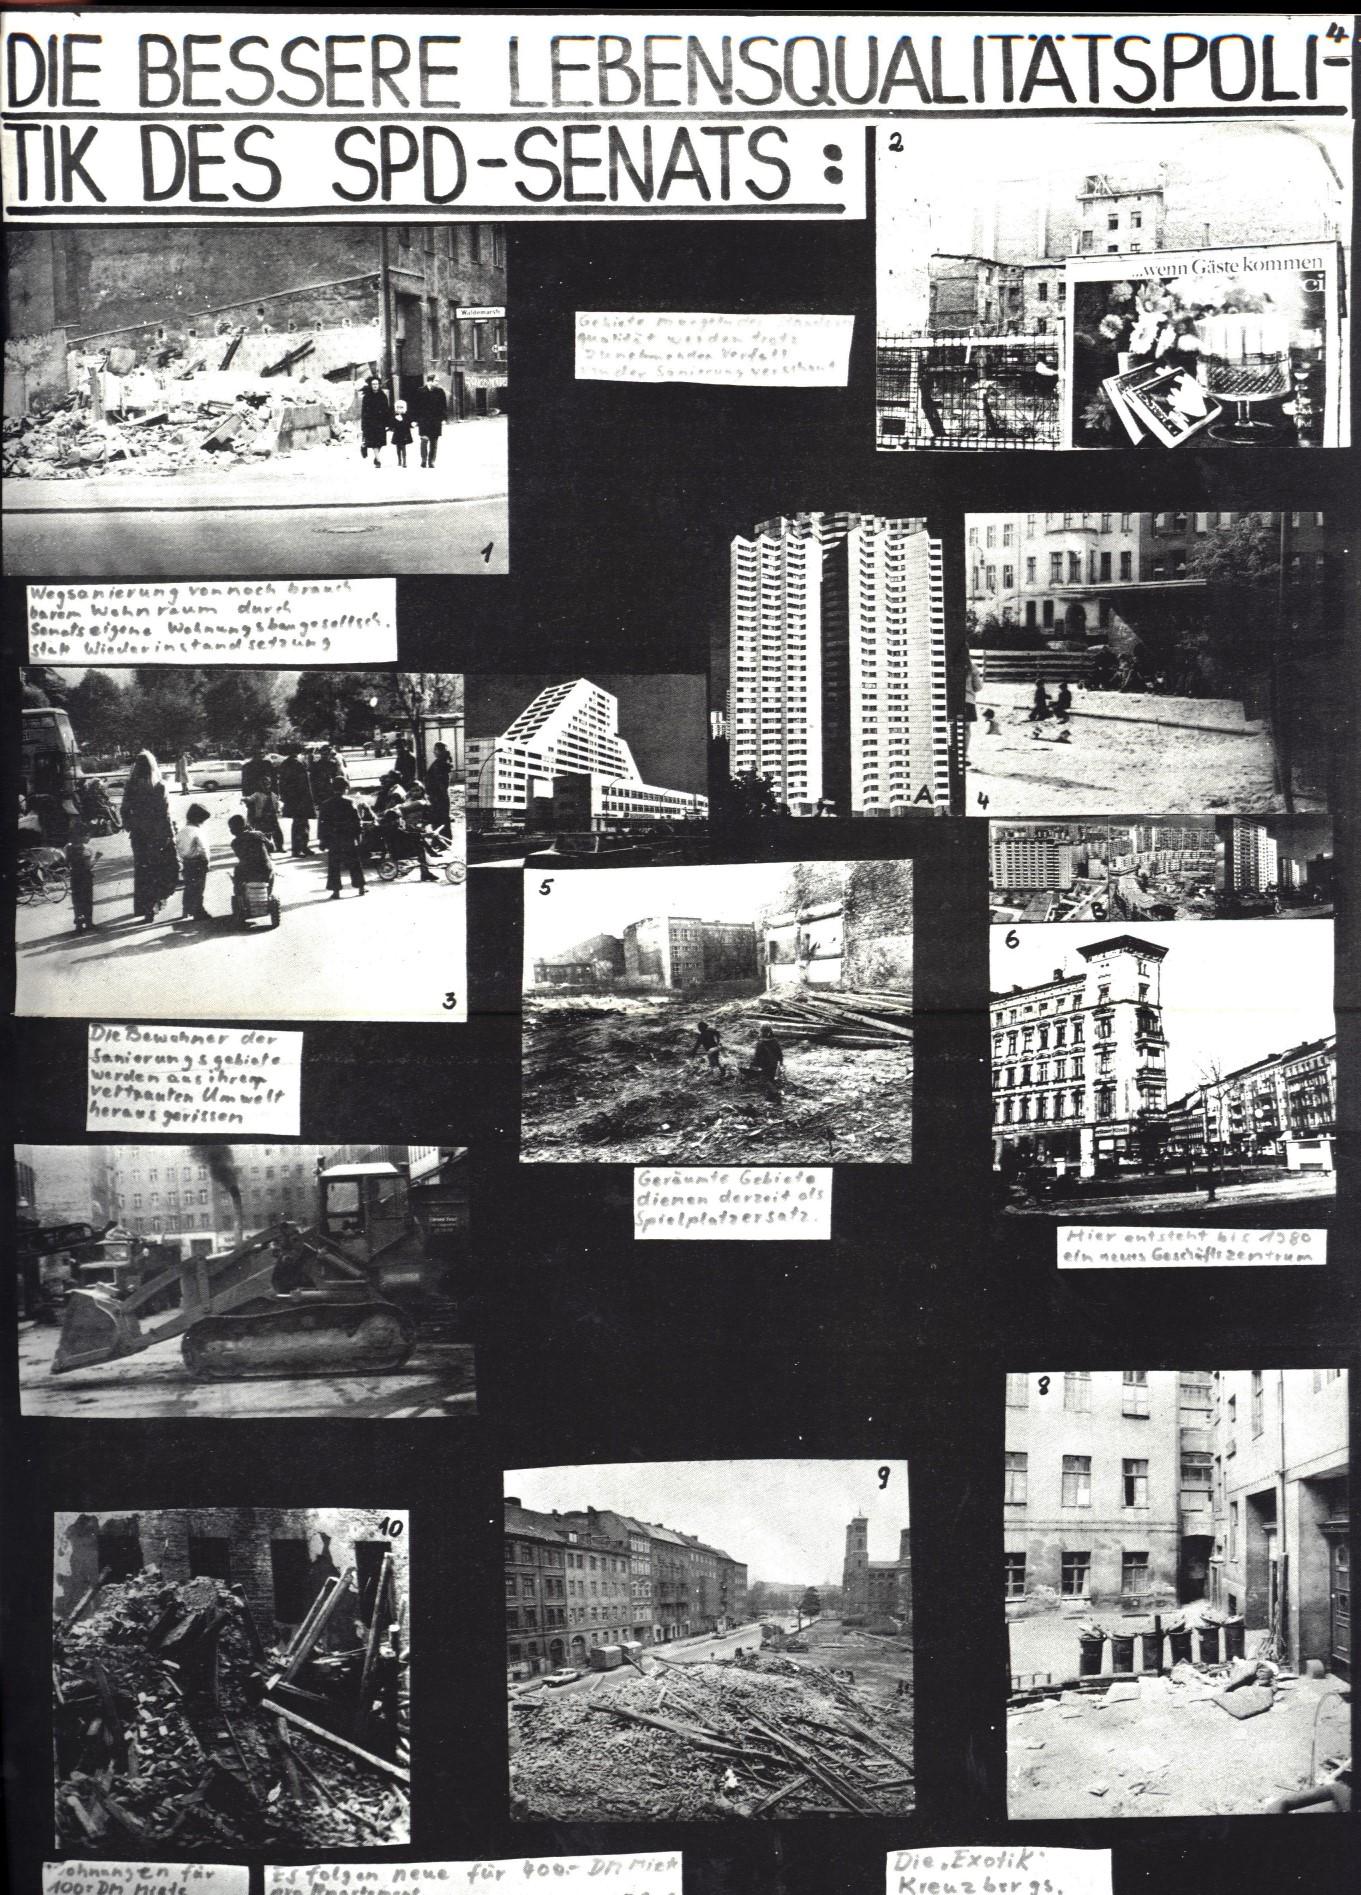 Berlin_KSV_1974_Rote_Bauwochen_17